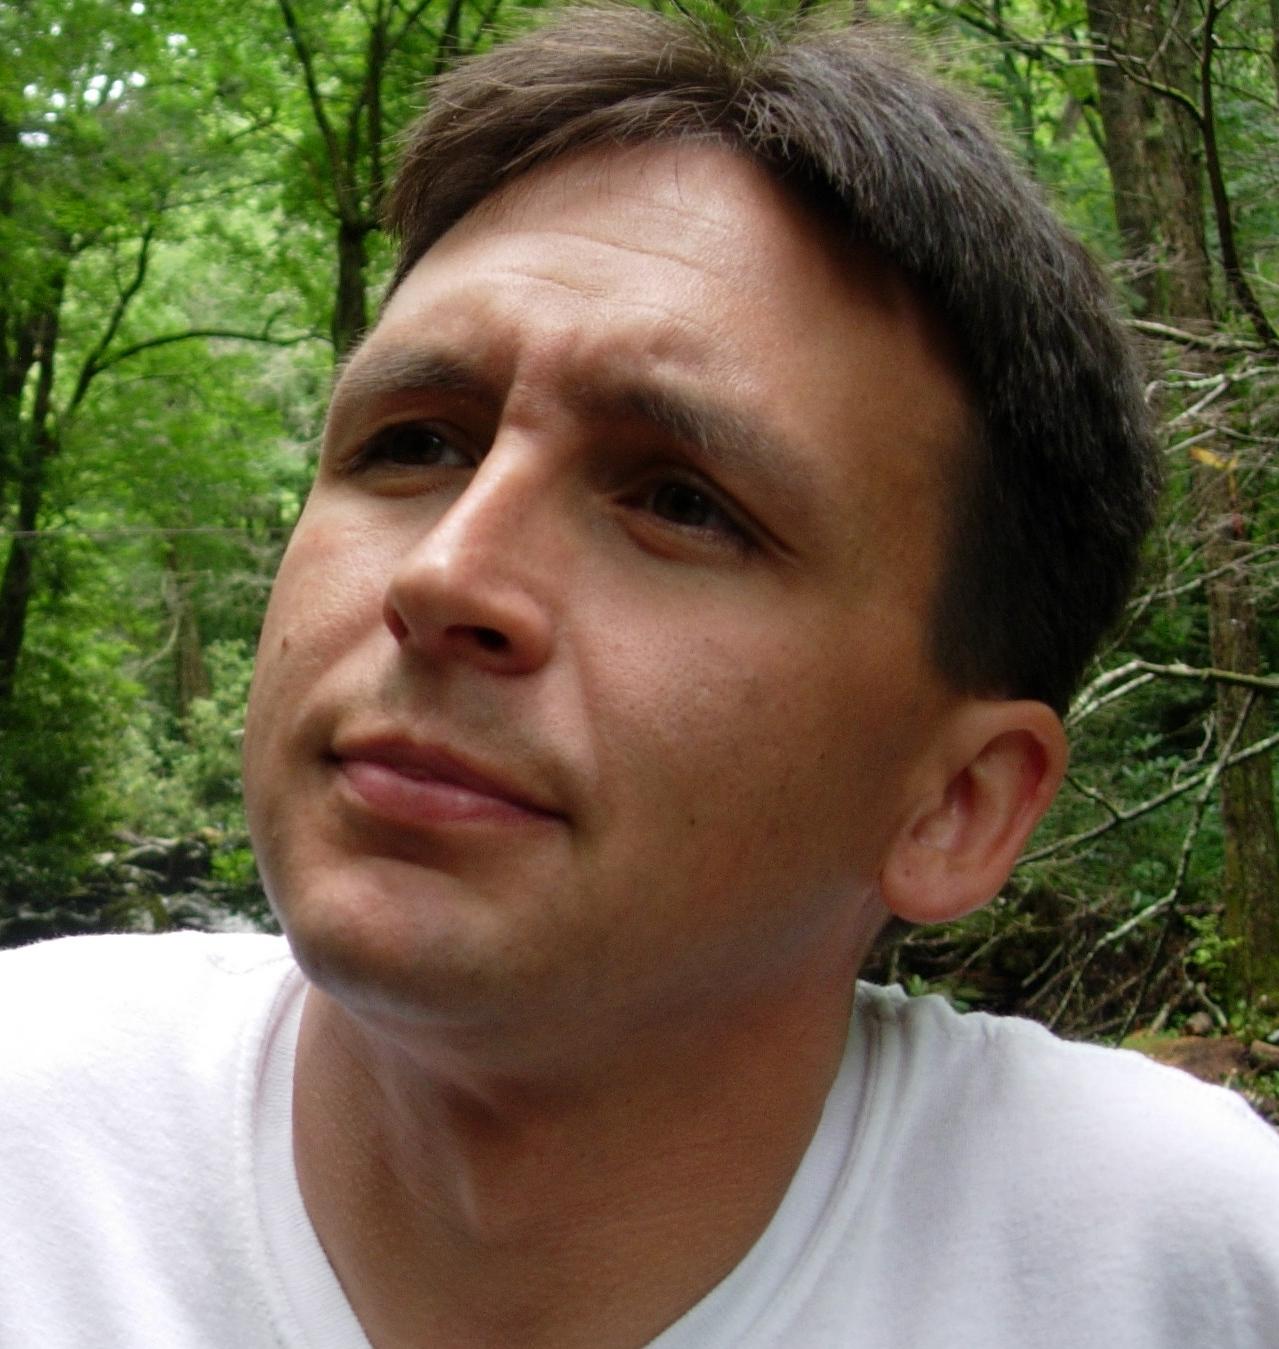 Enrique Bakemeyer